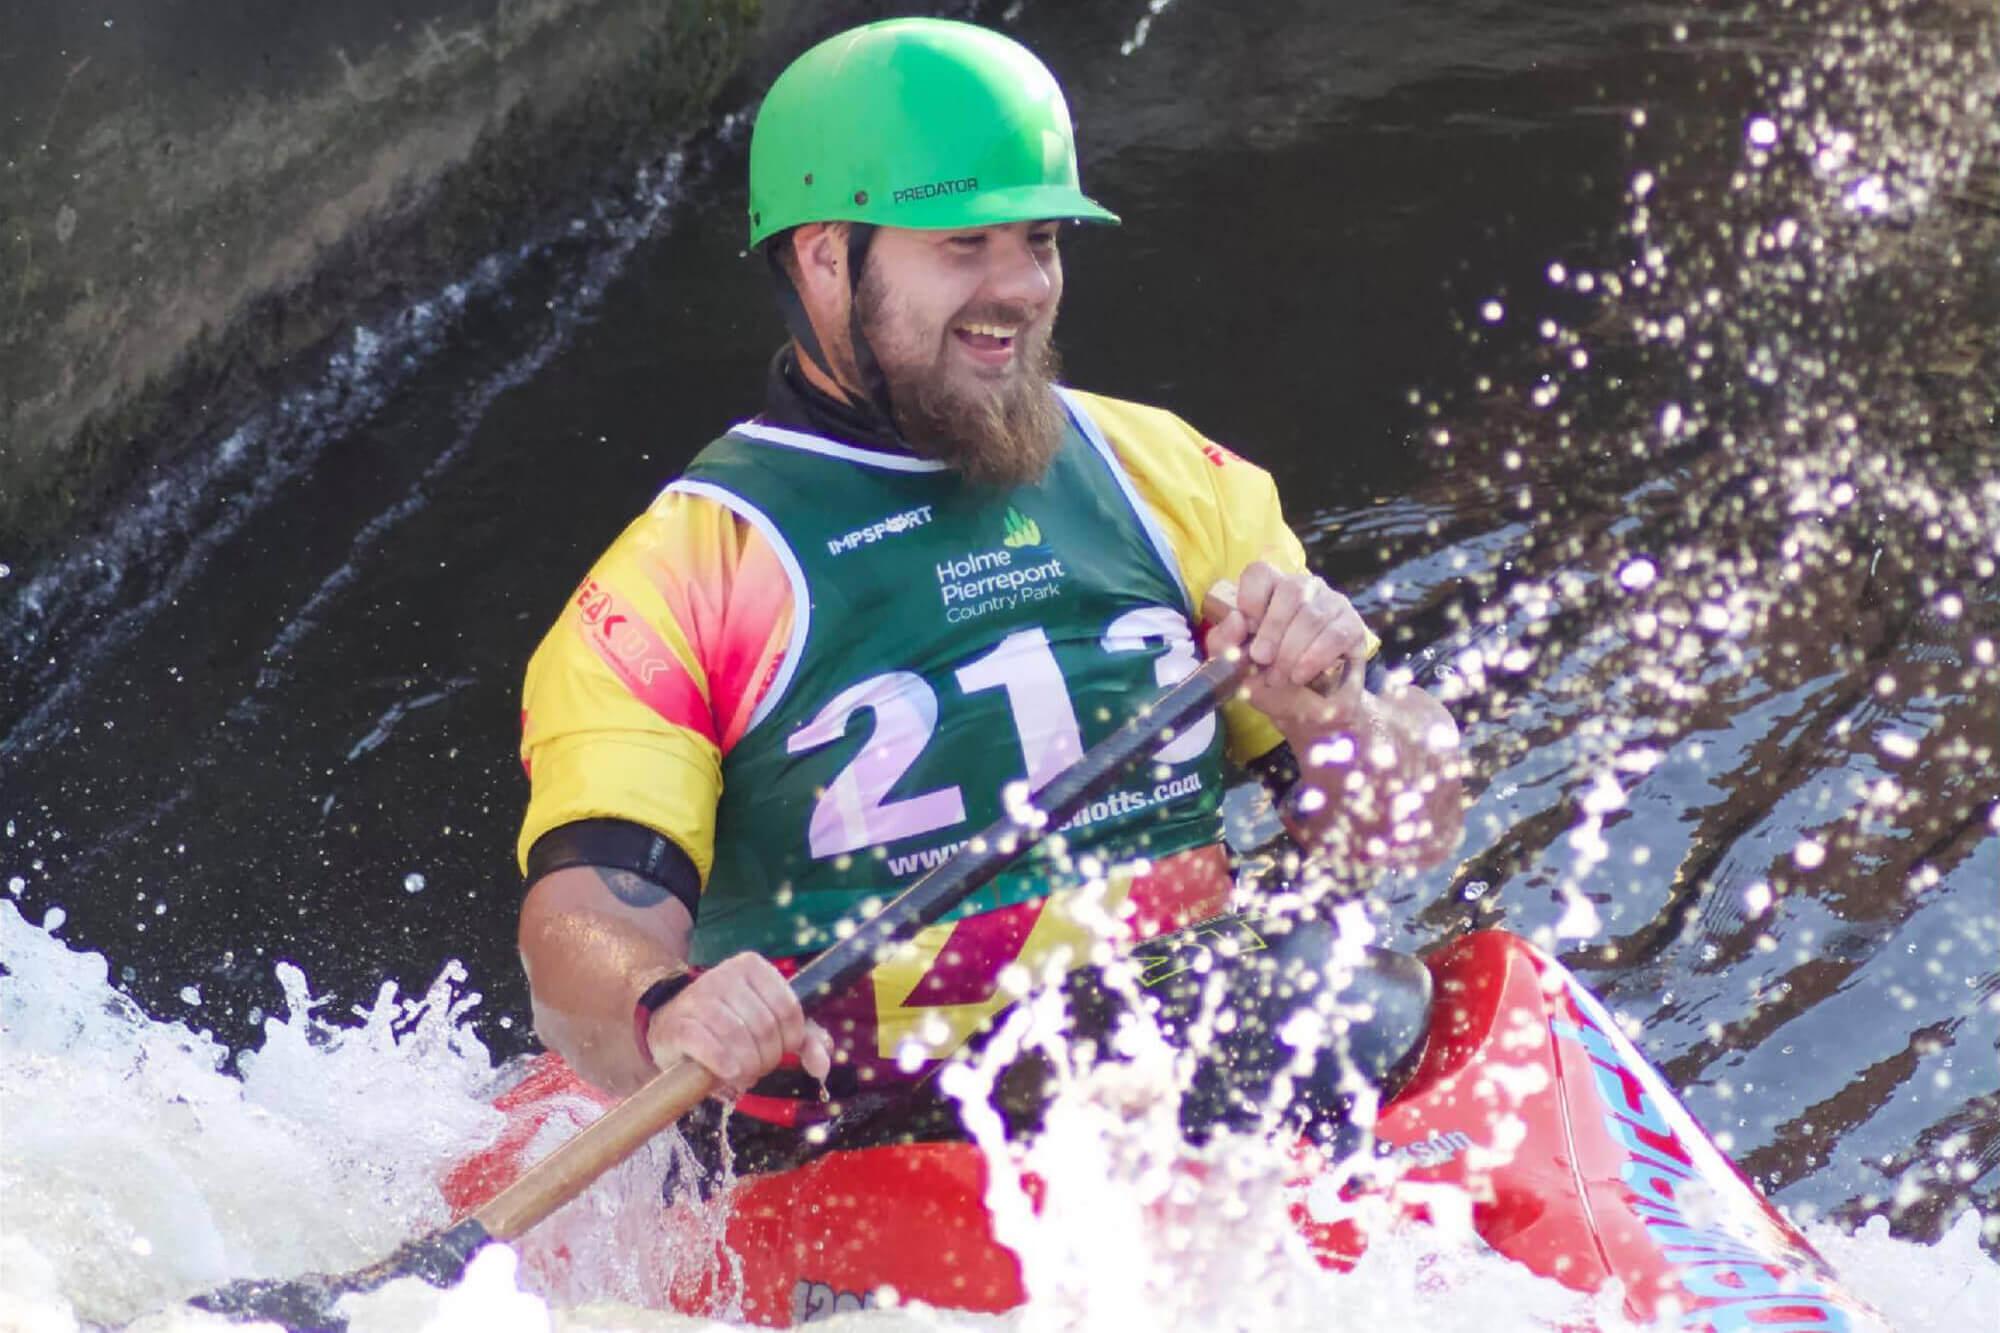 James kayaking surrounded by crashing waves